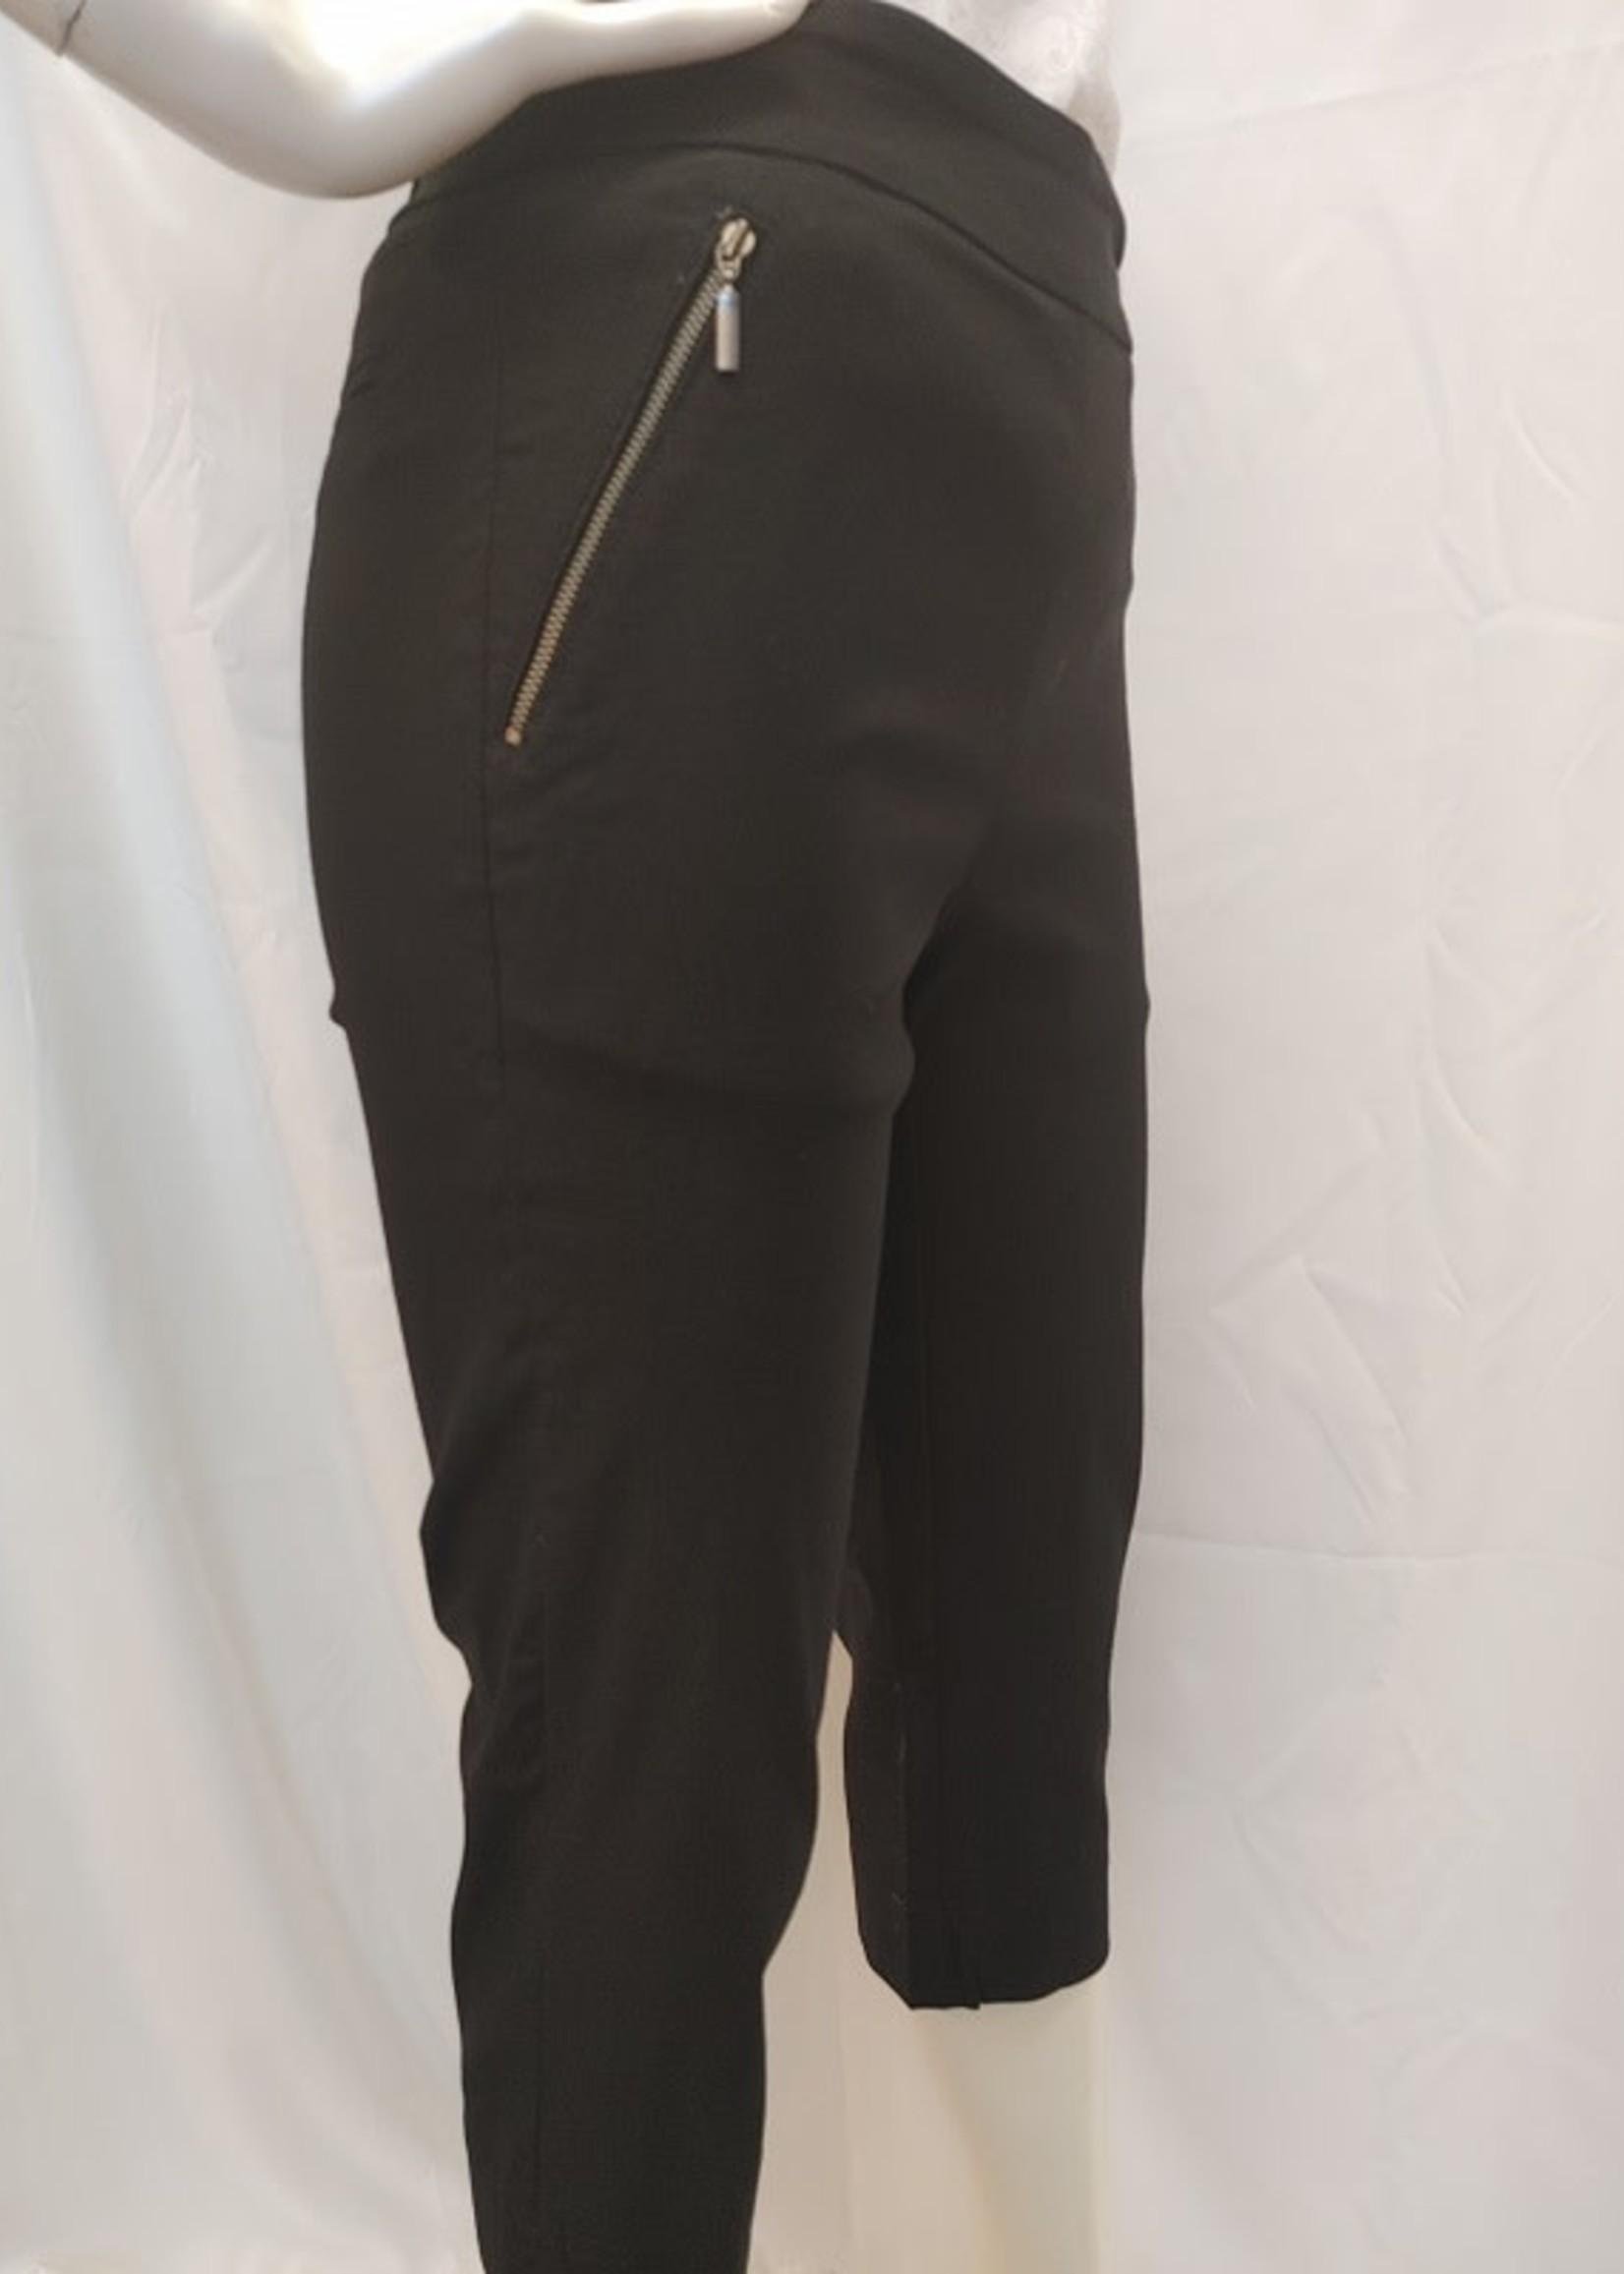 DKR & Co Capri with zipper pockets